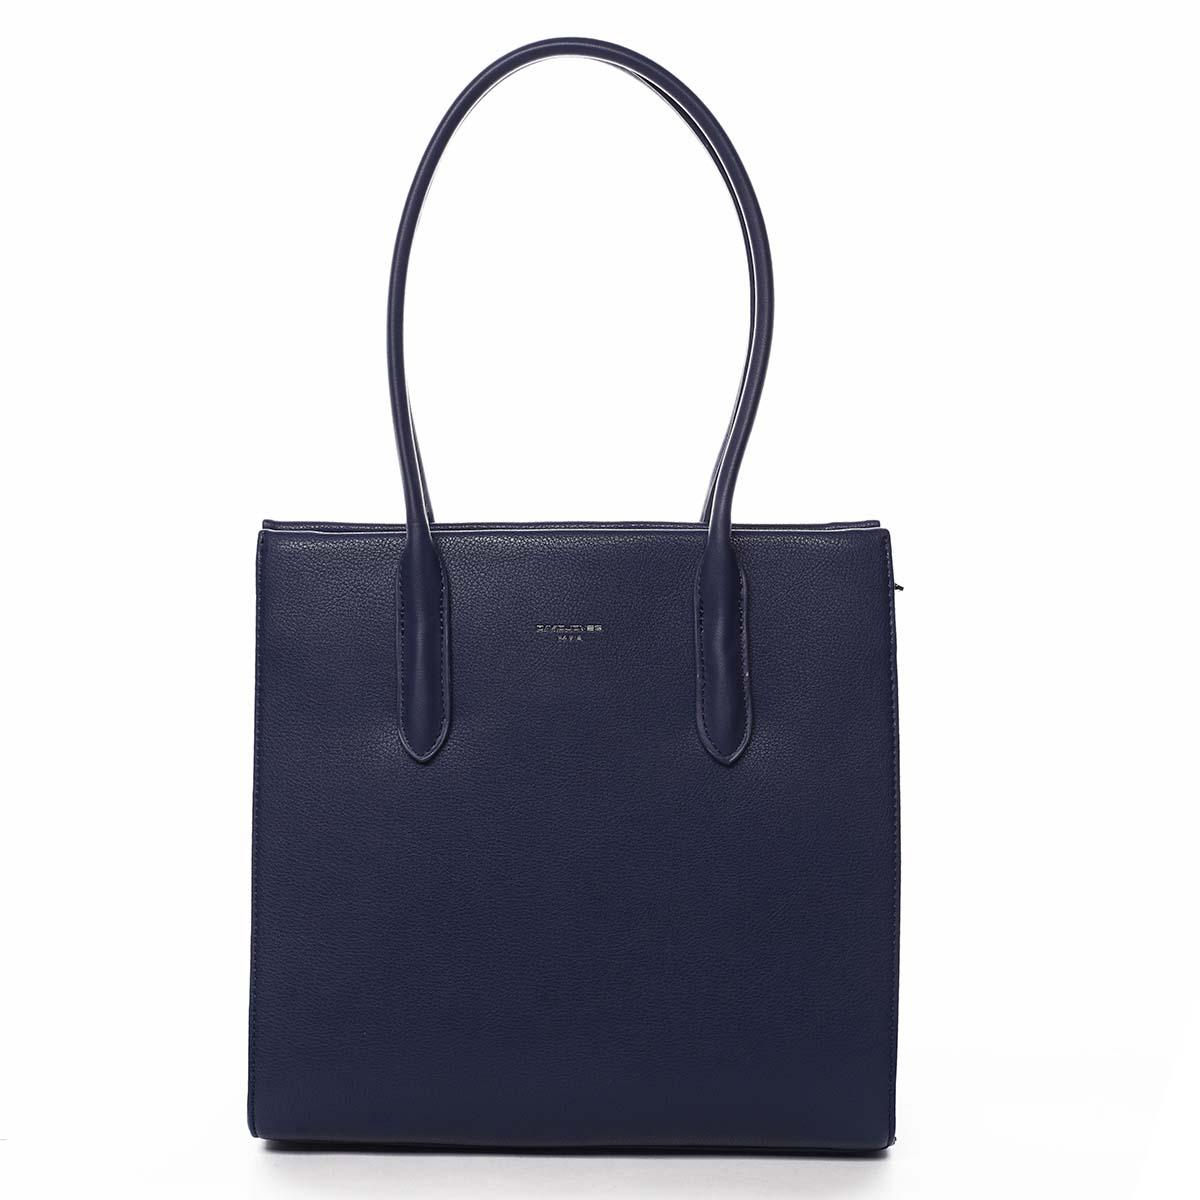 Dámska kabelka cez rameno tmavo modrá - David Jones Sementis tmavo modra